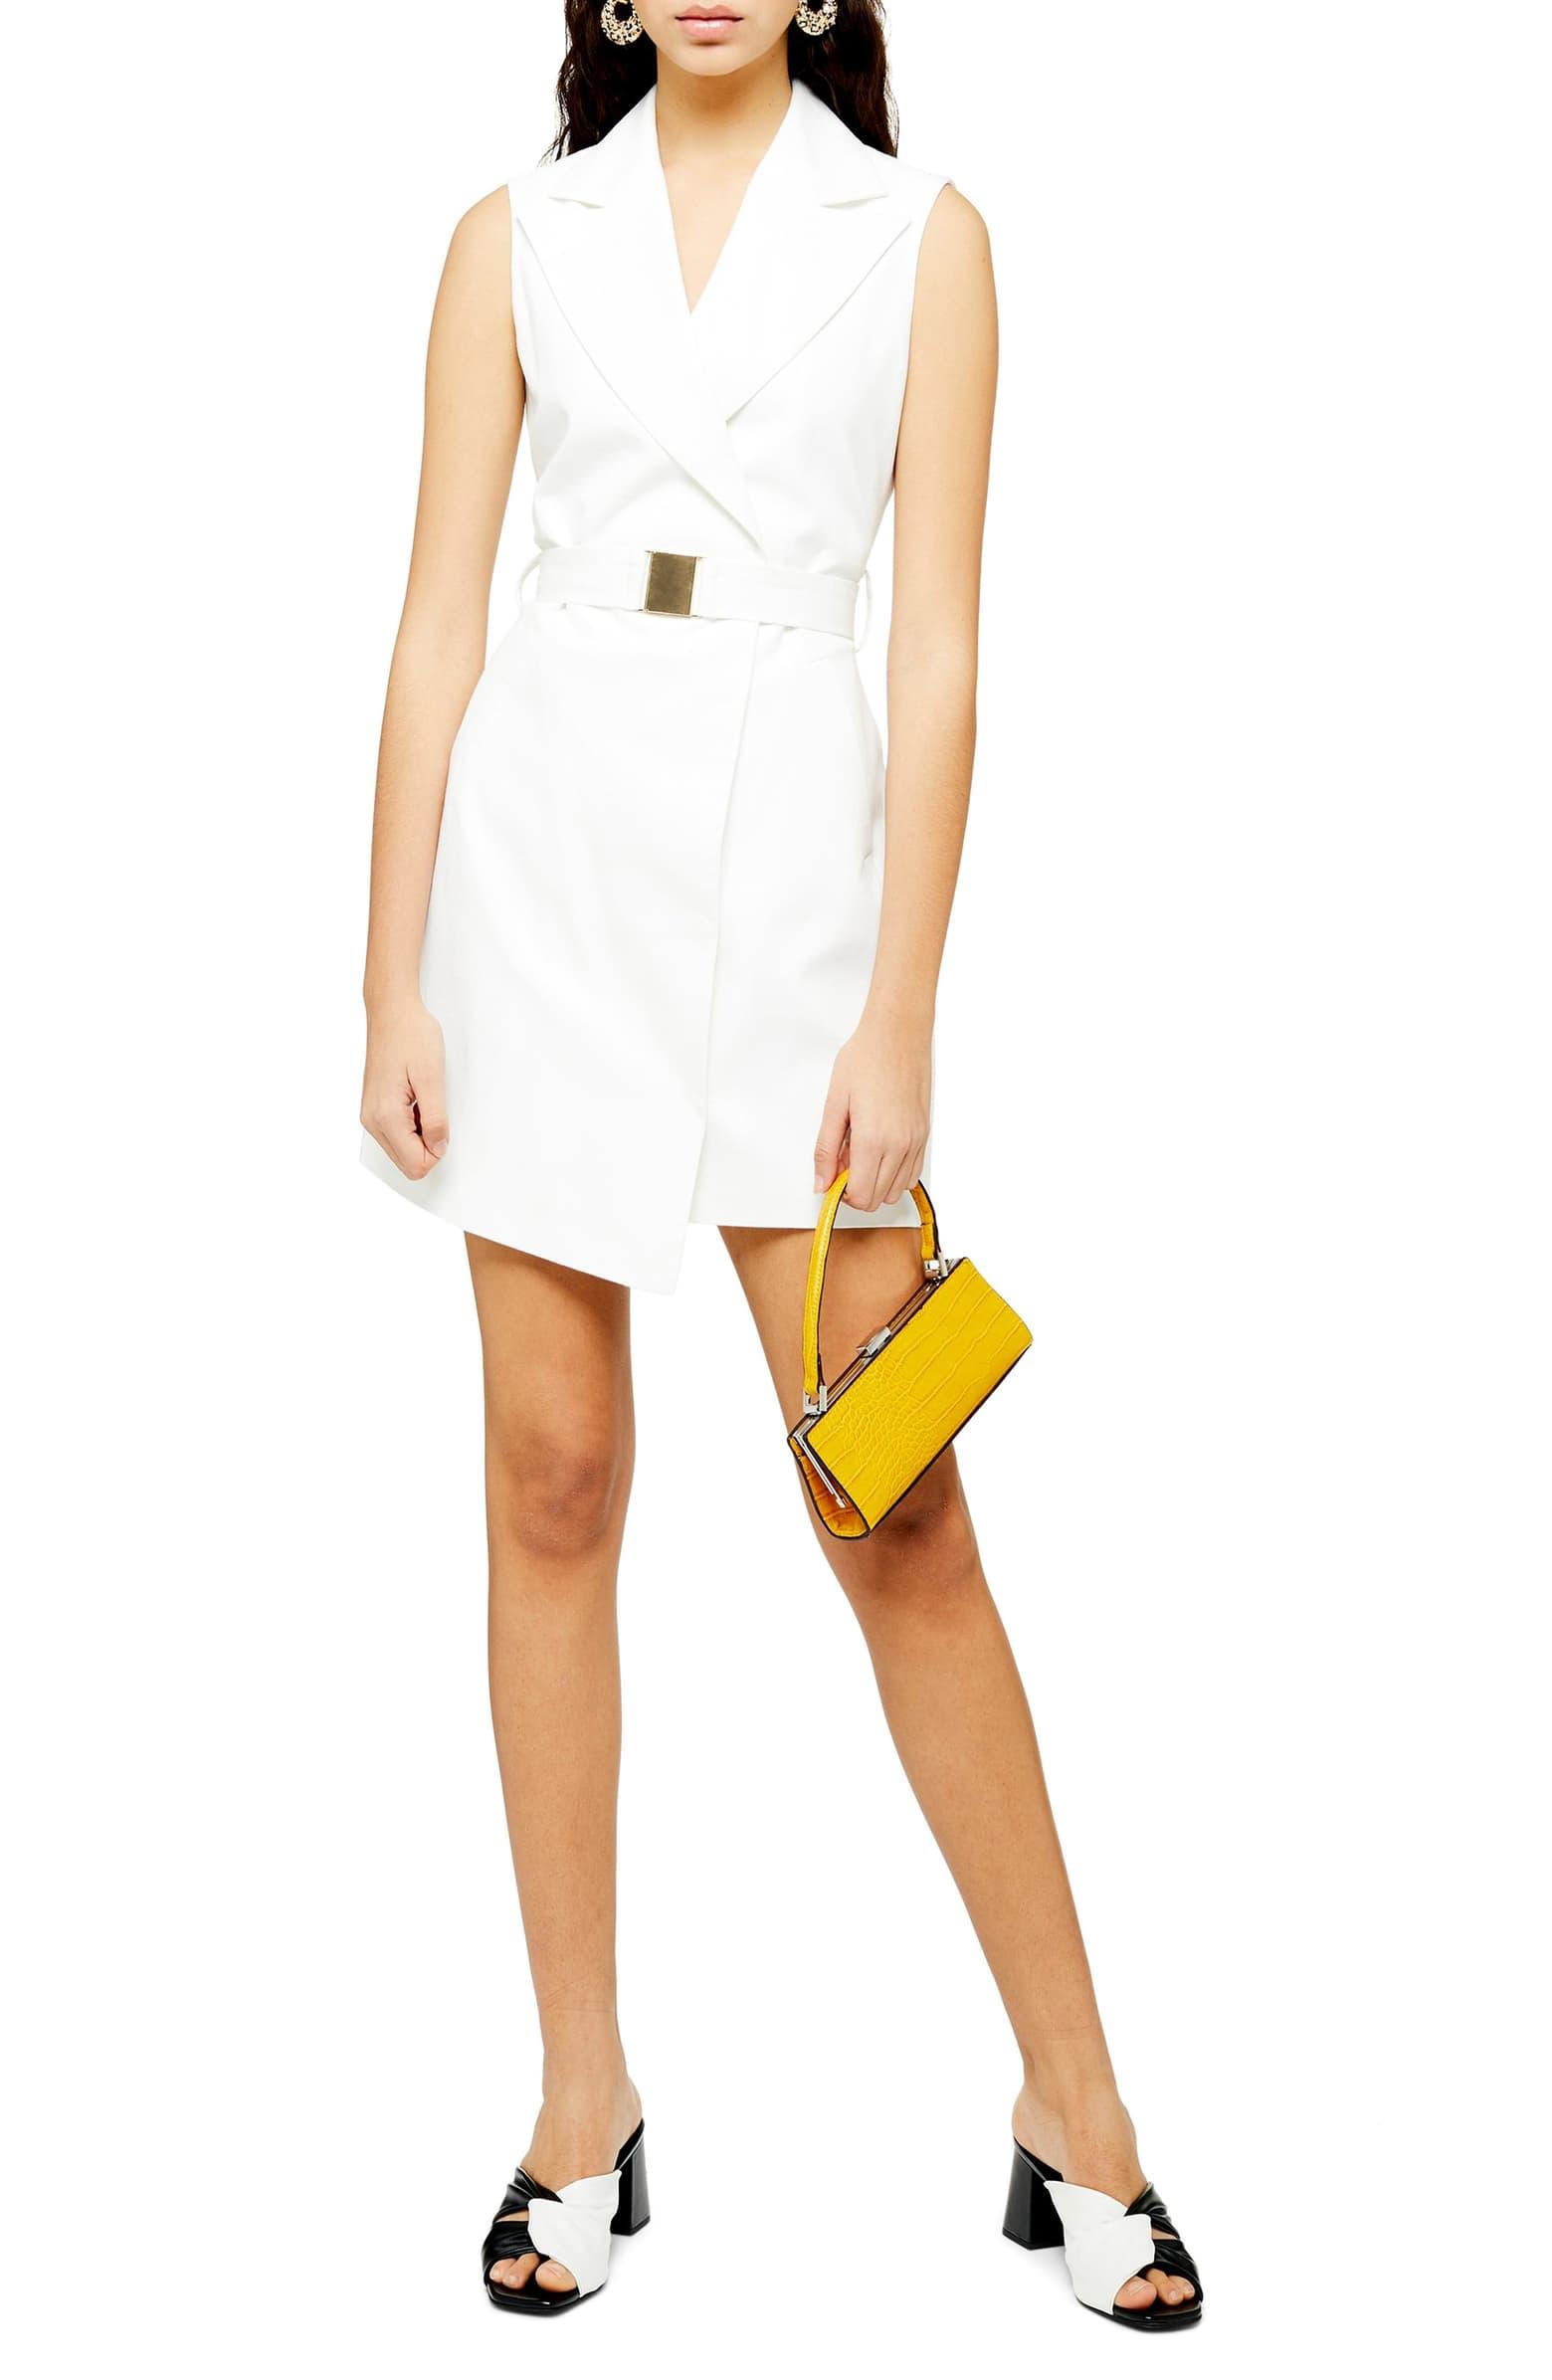 Sleeveless White Blazer, $125, Nordstrom